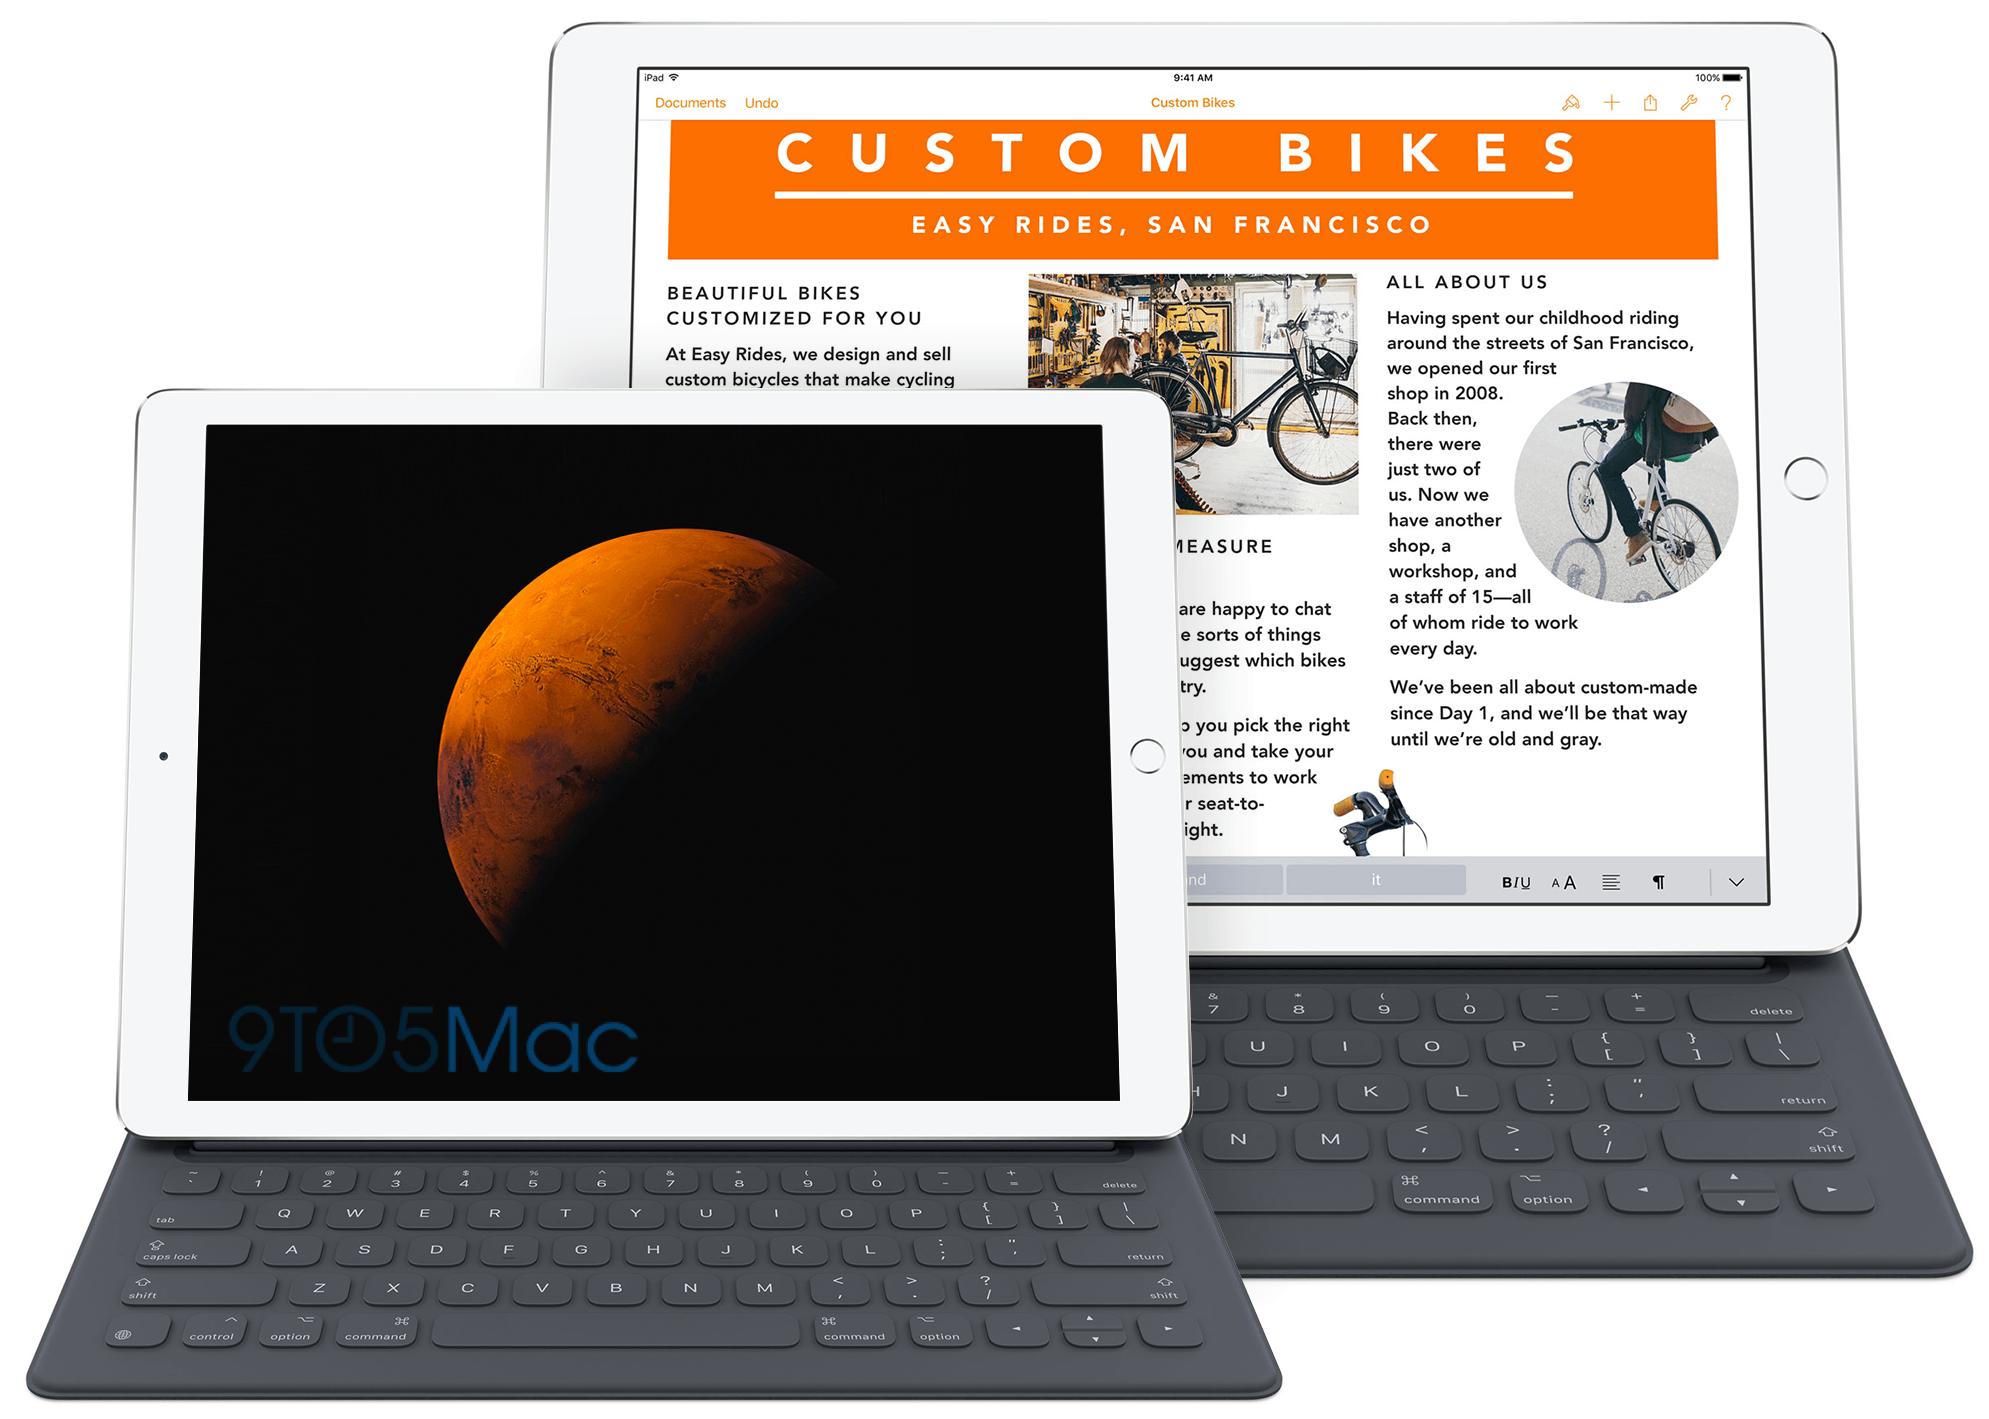 iPad Pro (de 12,9 e 9,7 polegadas)